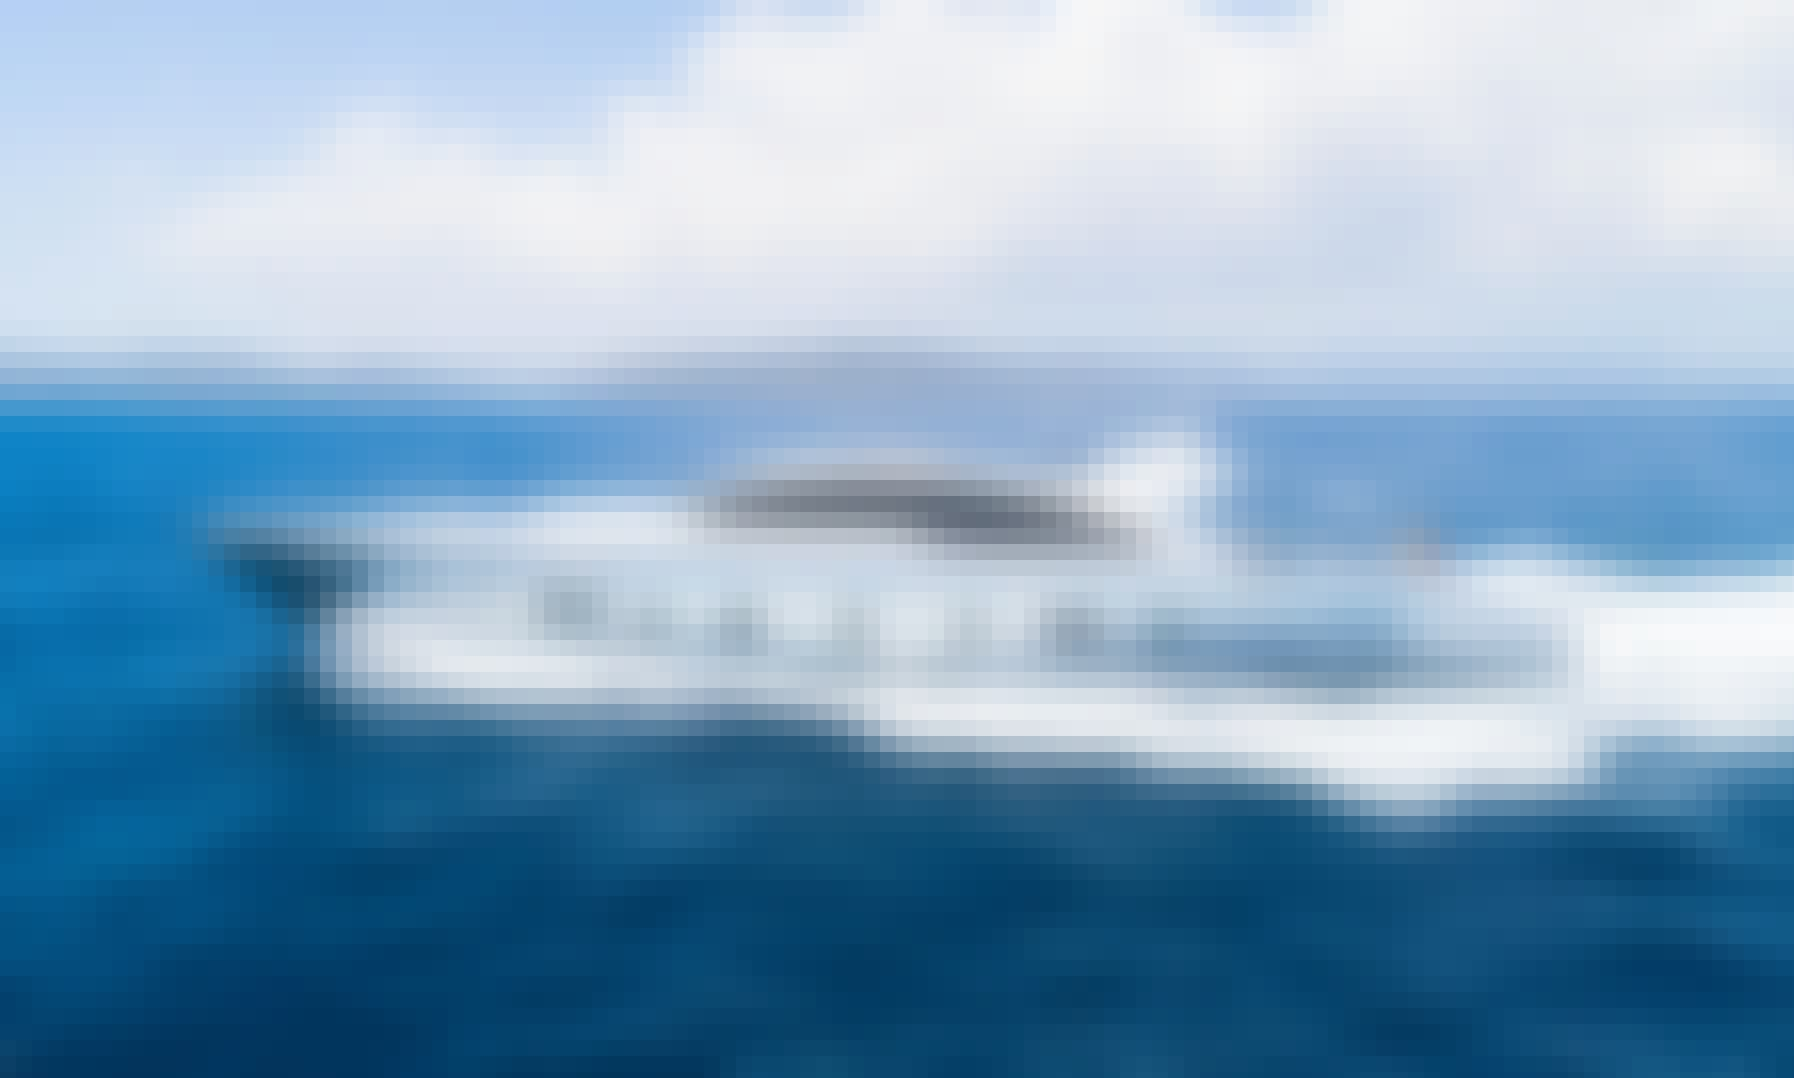 Blue Jay Tecnomar Super Yacht Charter in Ibiza, Islas Baleares